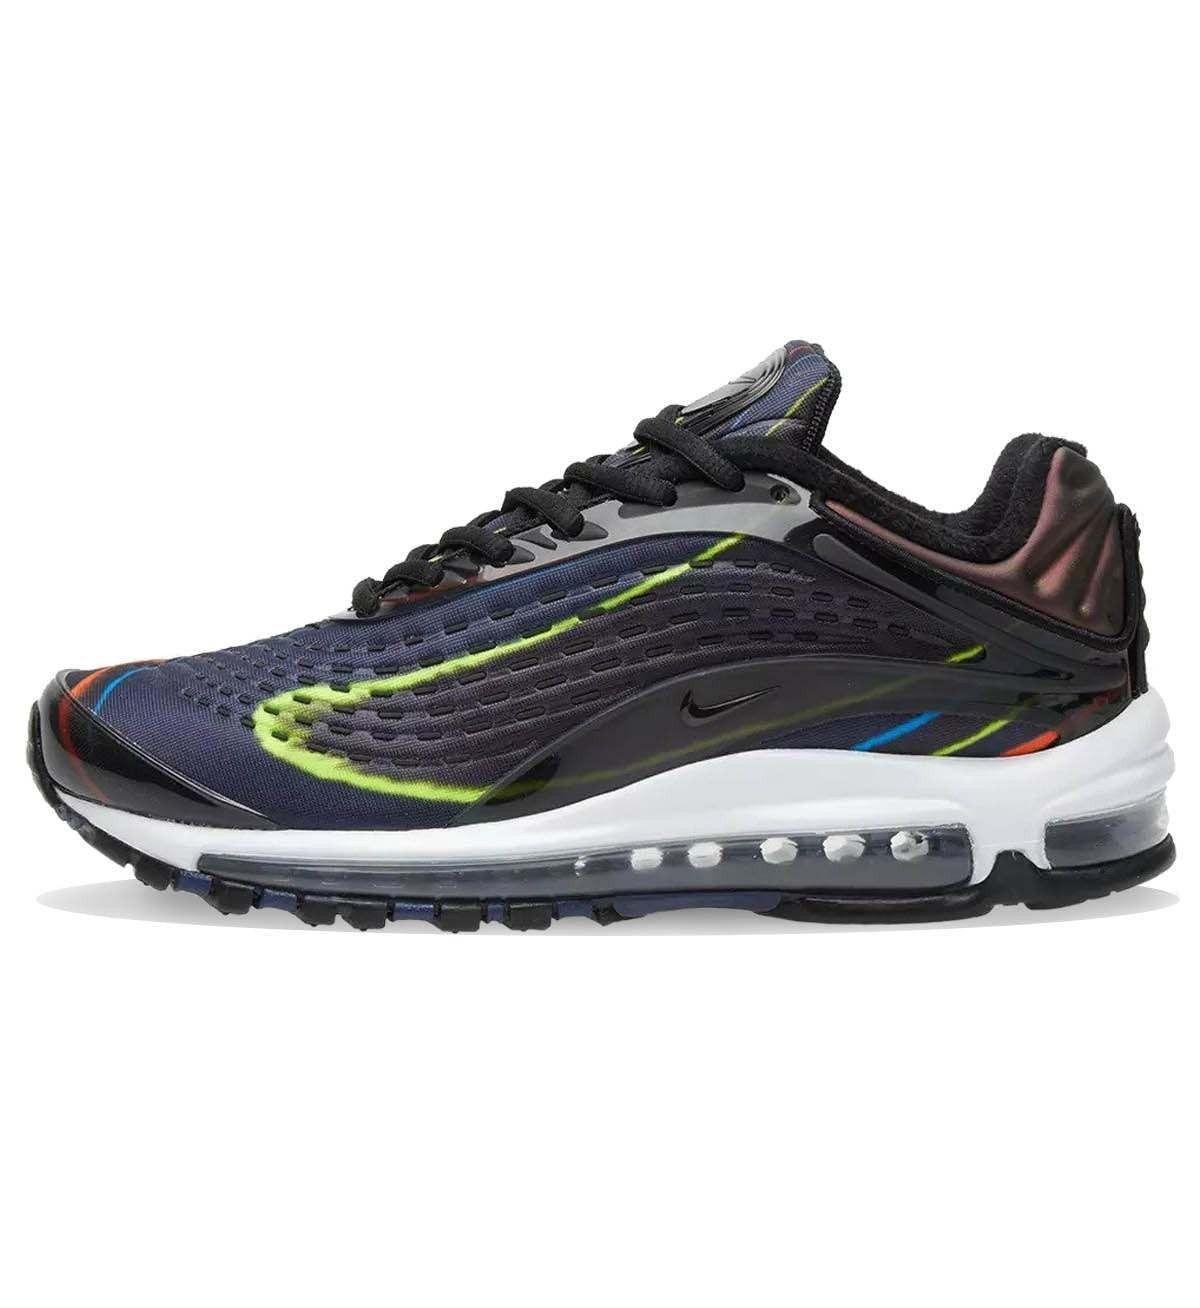 Nike Air Max Deluxe £79.19 + £2.99 p&p